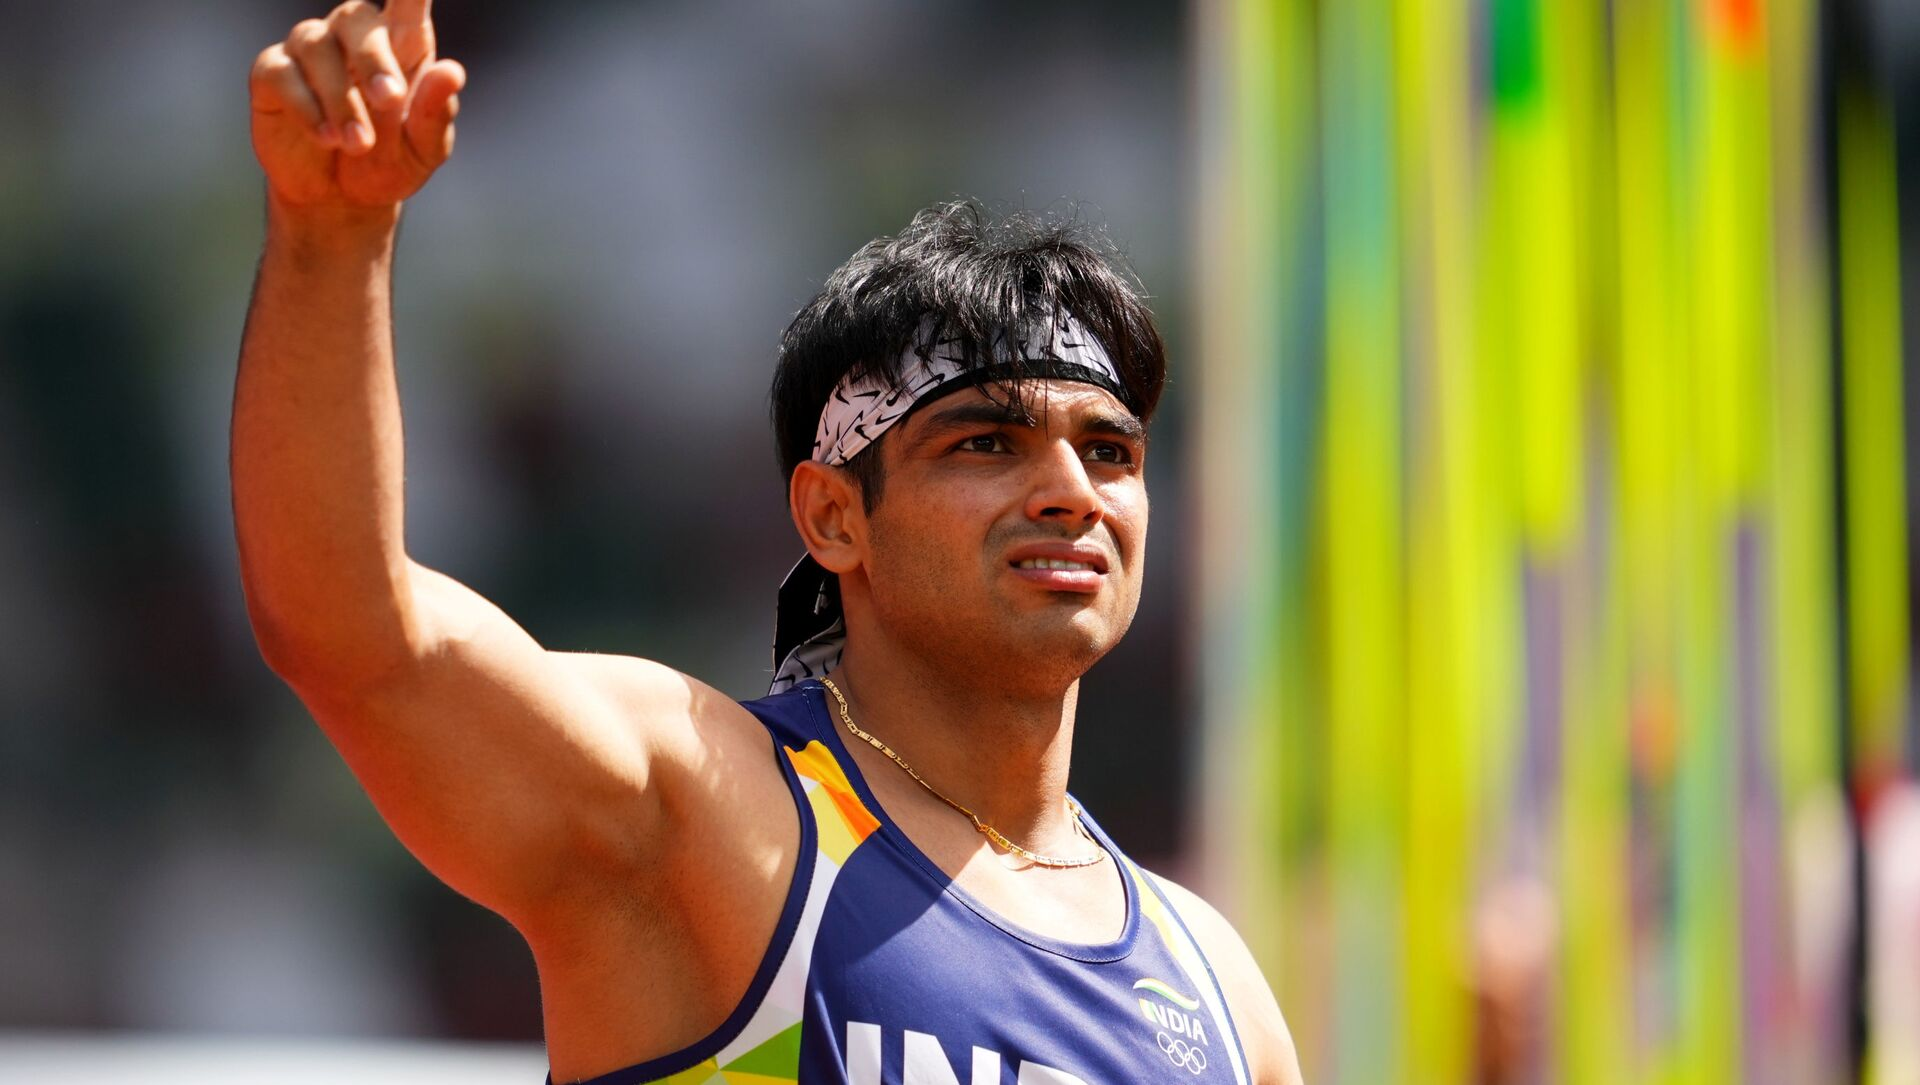 Tokyo 2020 Olympics - Athletics - Men's Javelin Throw - Qualification - Olympic Stadium, Tokyo, Japan - August 4, 2021. Neeraj Chopra of India reacts  - Sputnik International, 1920, 04.08.2021